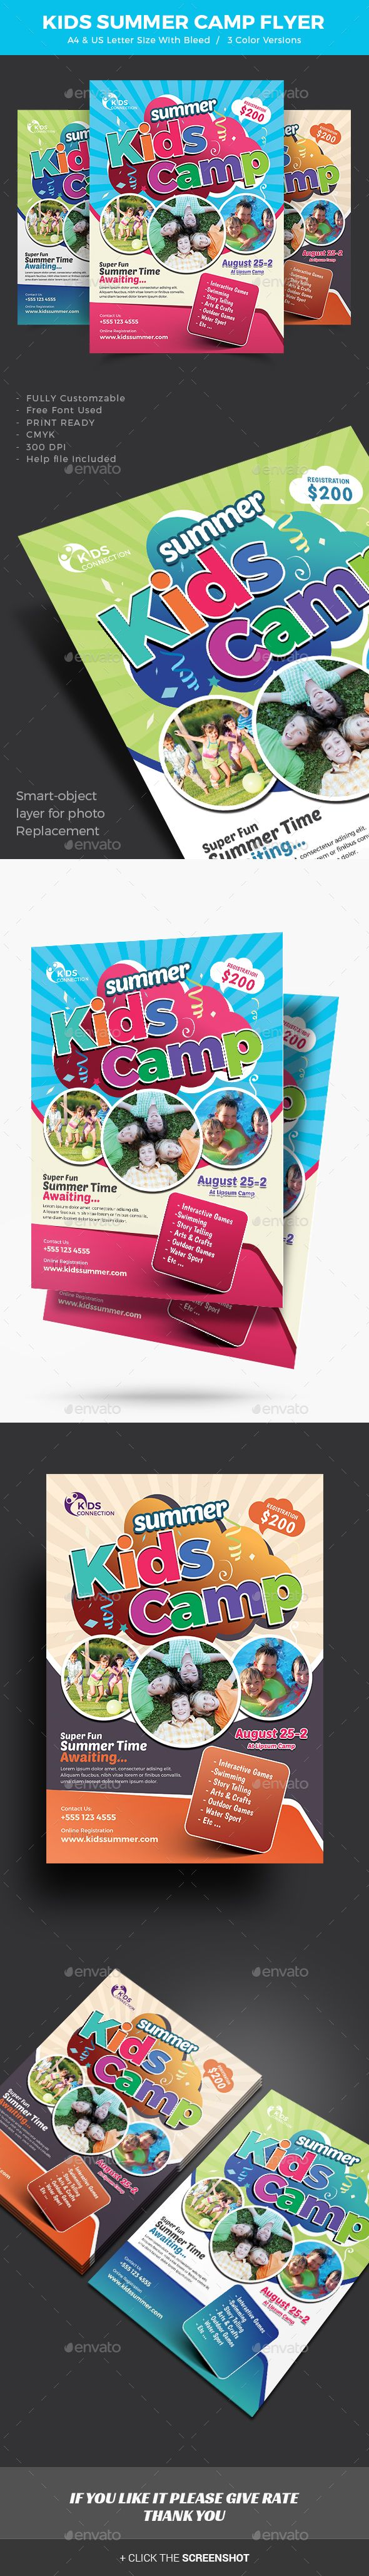 Kids Summer Camp Flyer   Ilustraciones